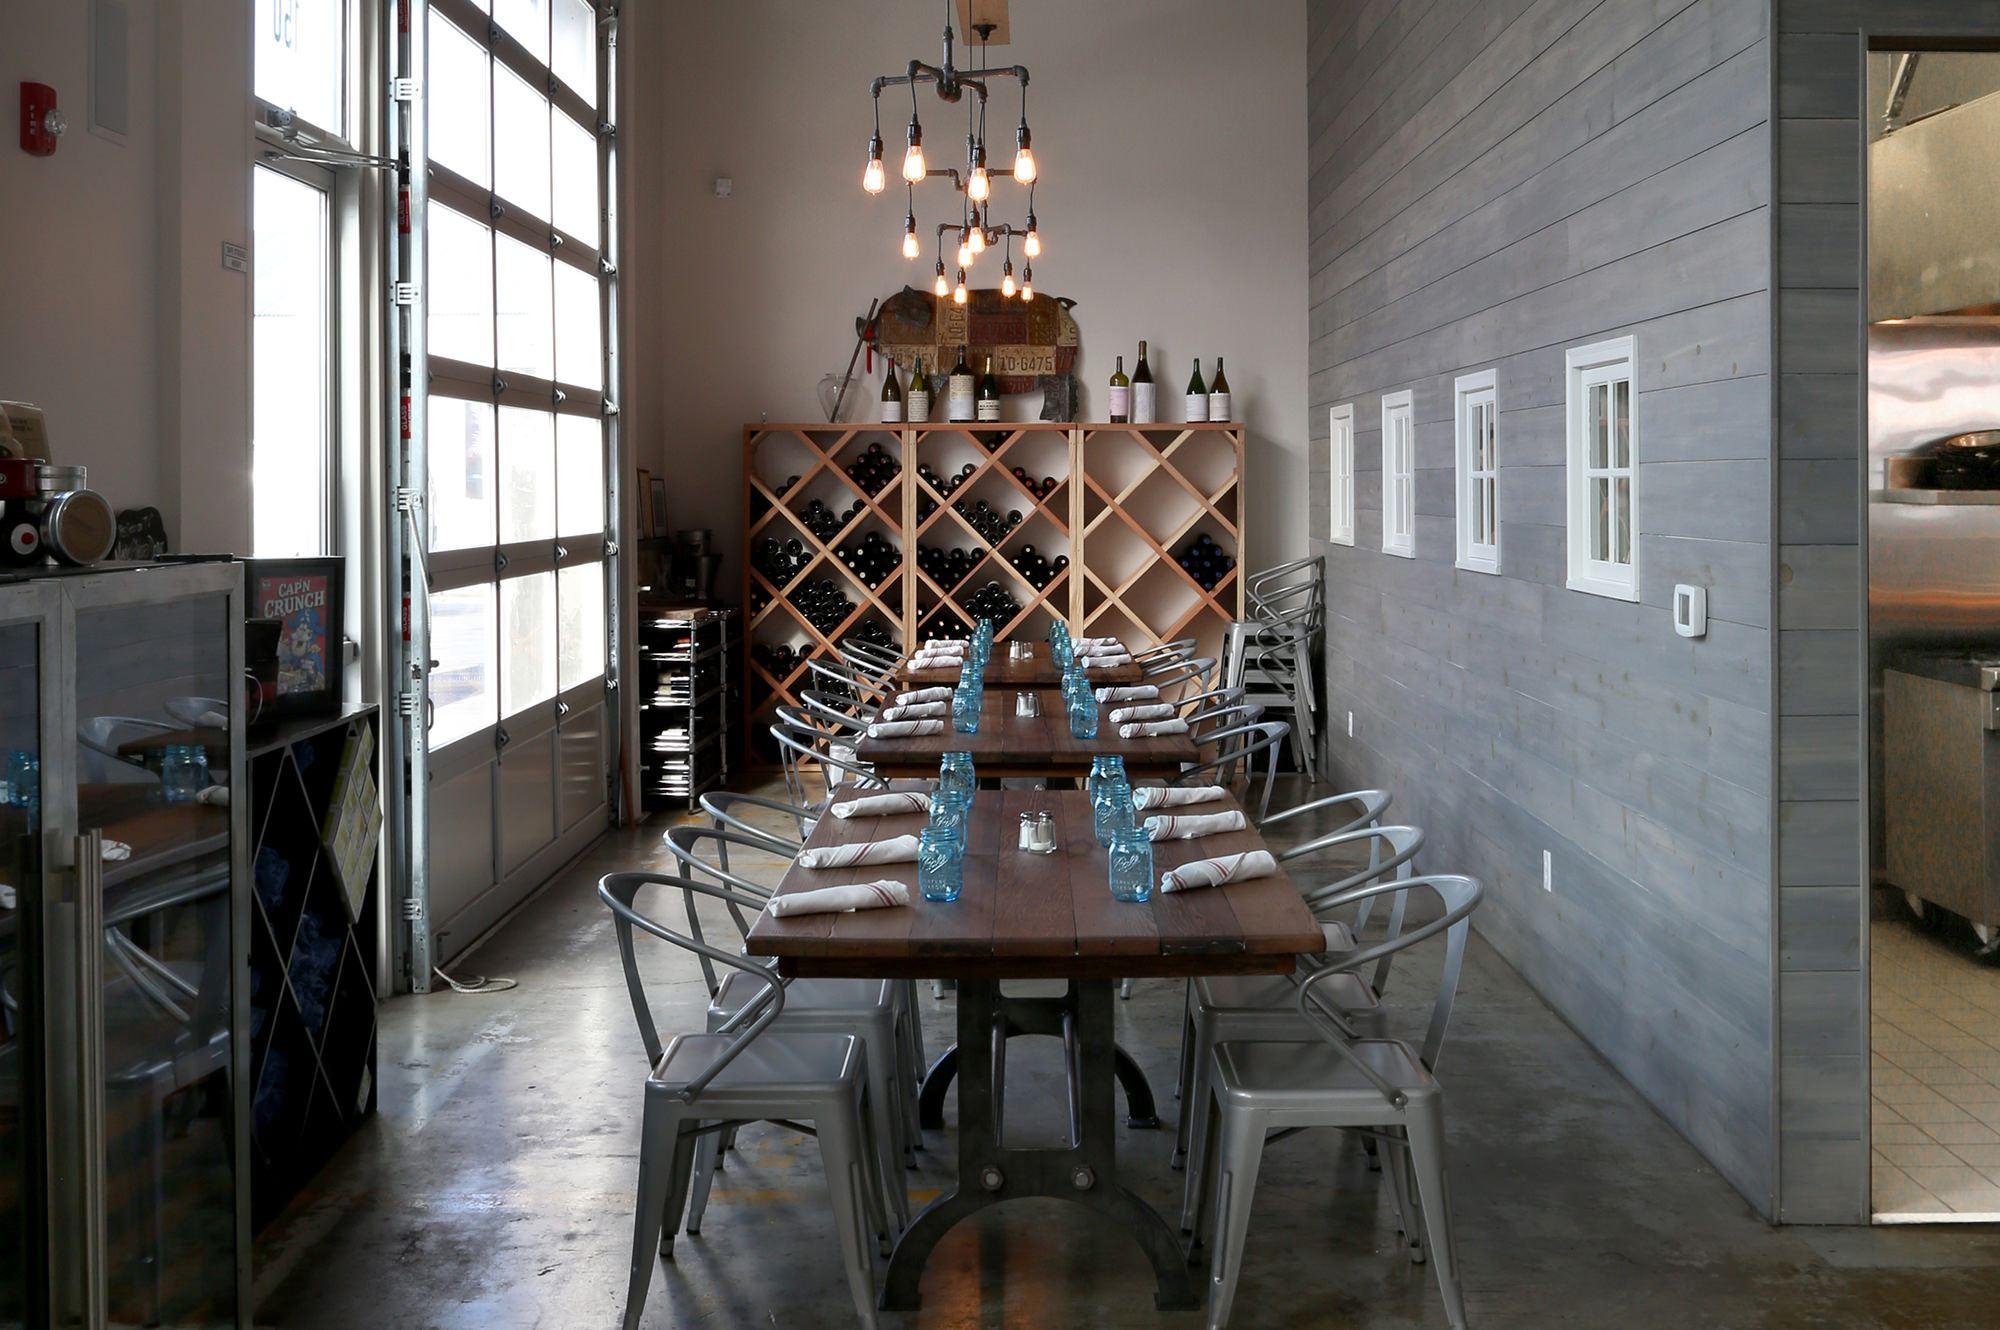 Inside of Zazu Restaurant in the Barlow